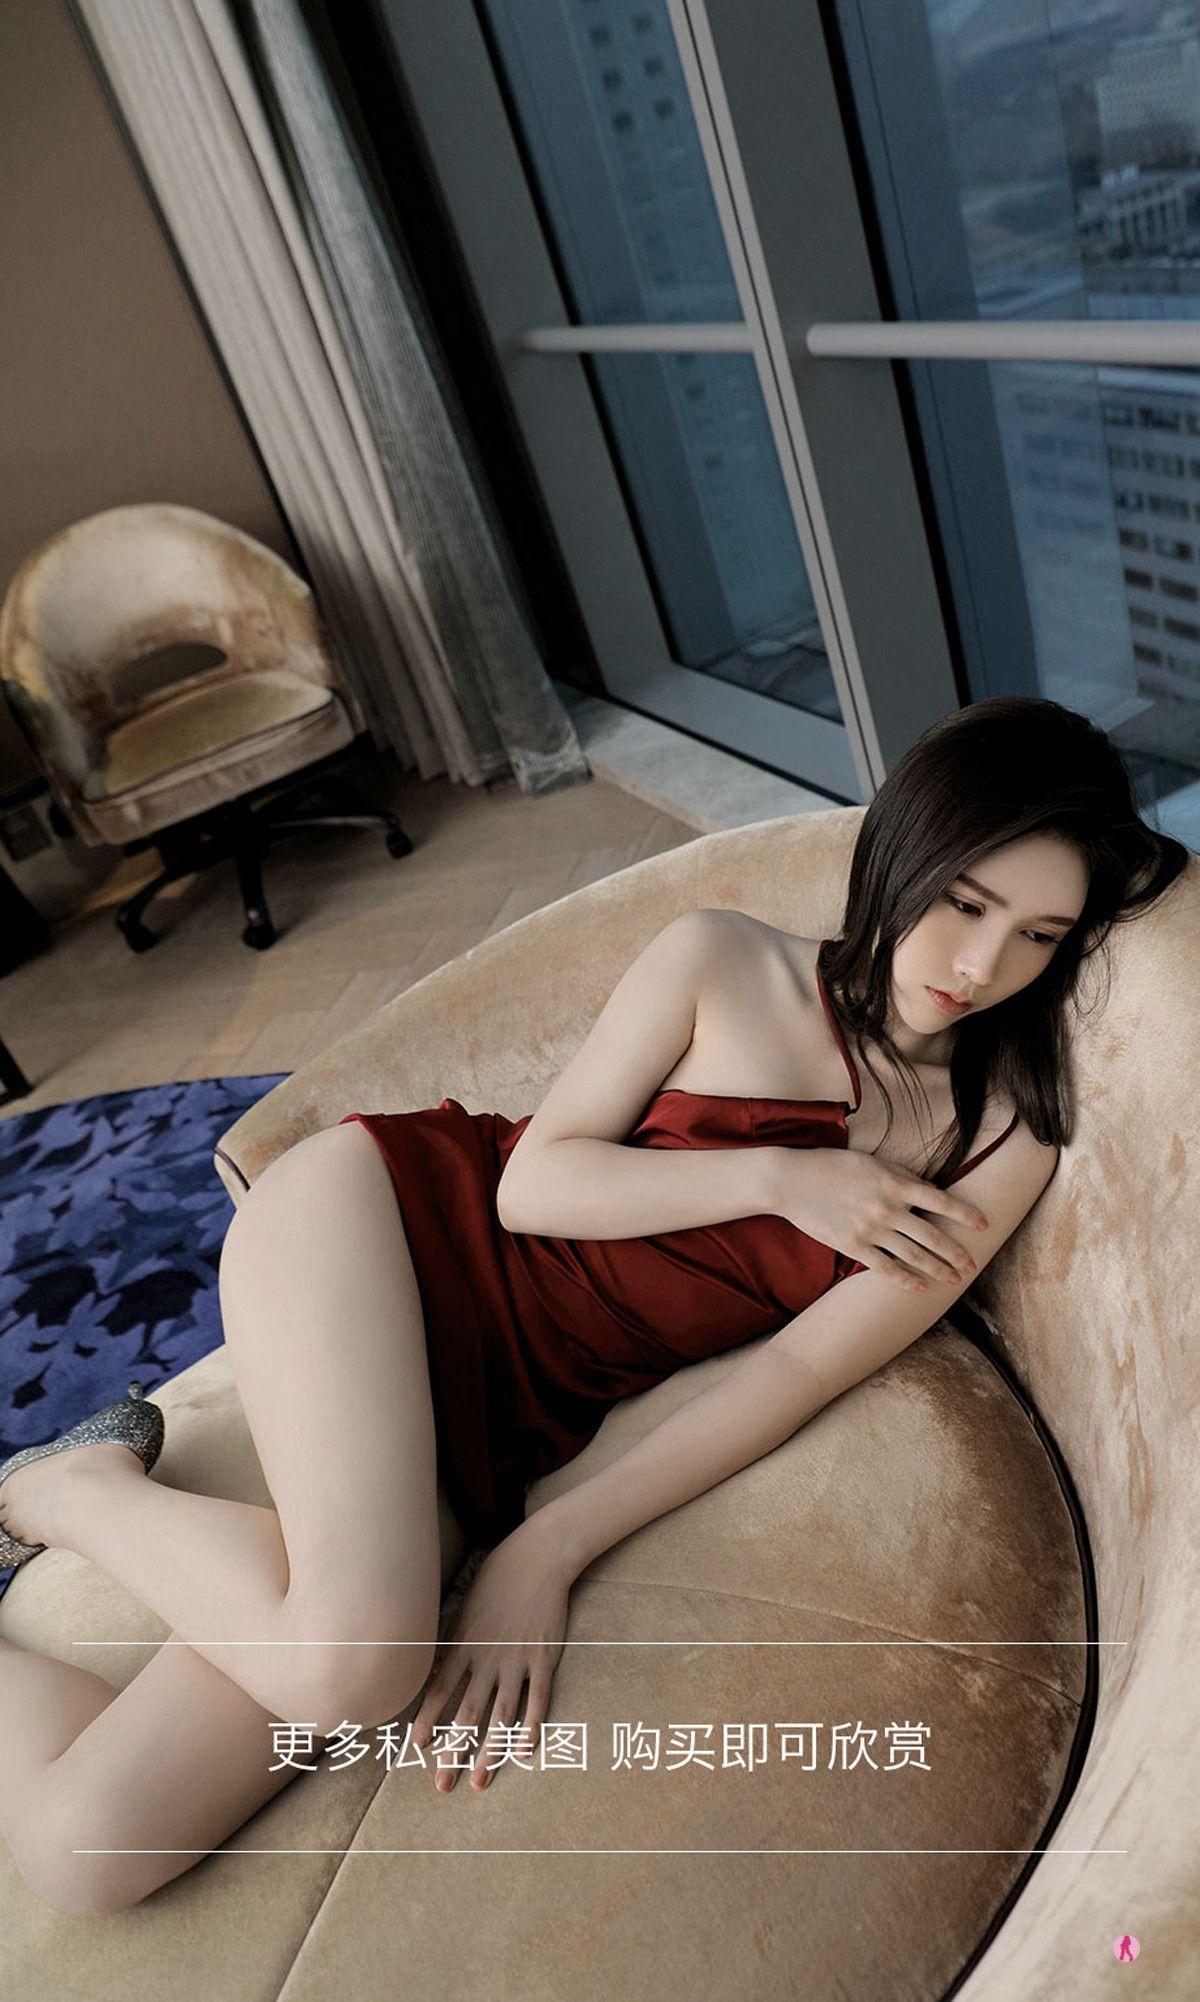 VOL.109 [尤果圈爱尤物]美臀吊带:吴雪瑶超高清写真套图(35P)